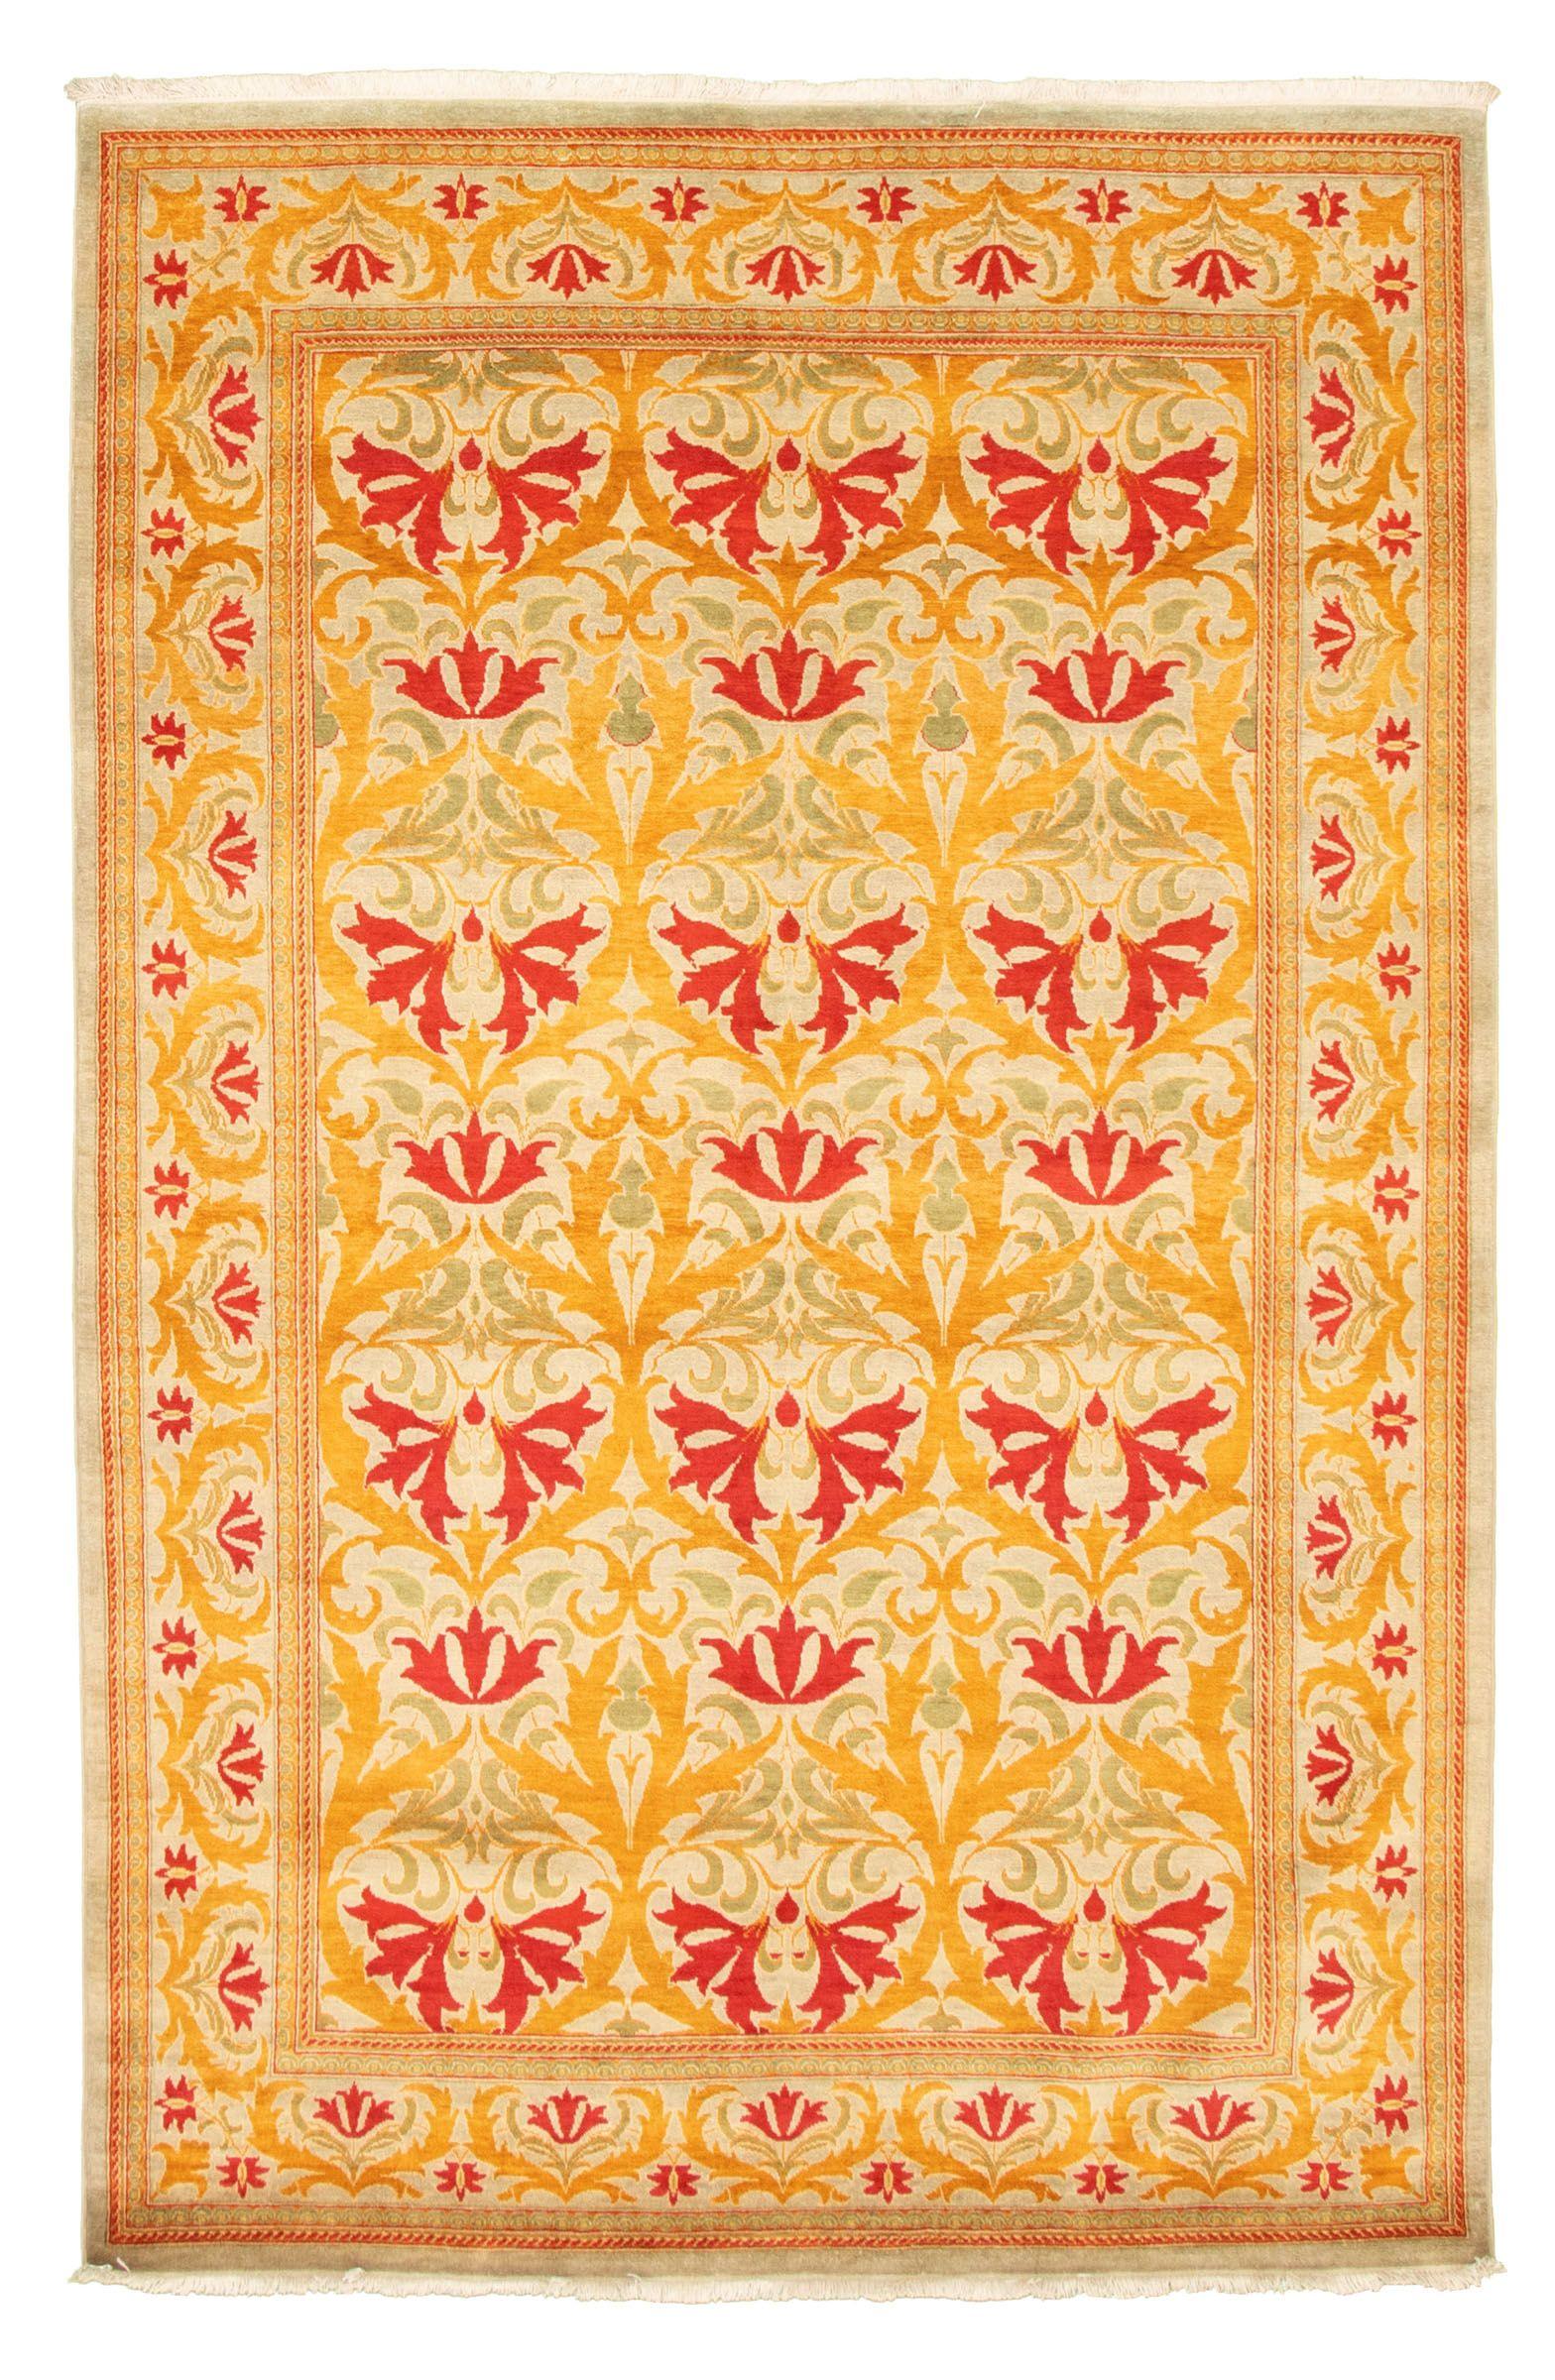 Pakistani 18 20 Pak Finest 6 2 X 9 0 Hand Knotted Wool Orange Rug Ecarpetgallery